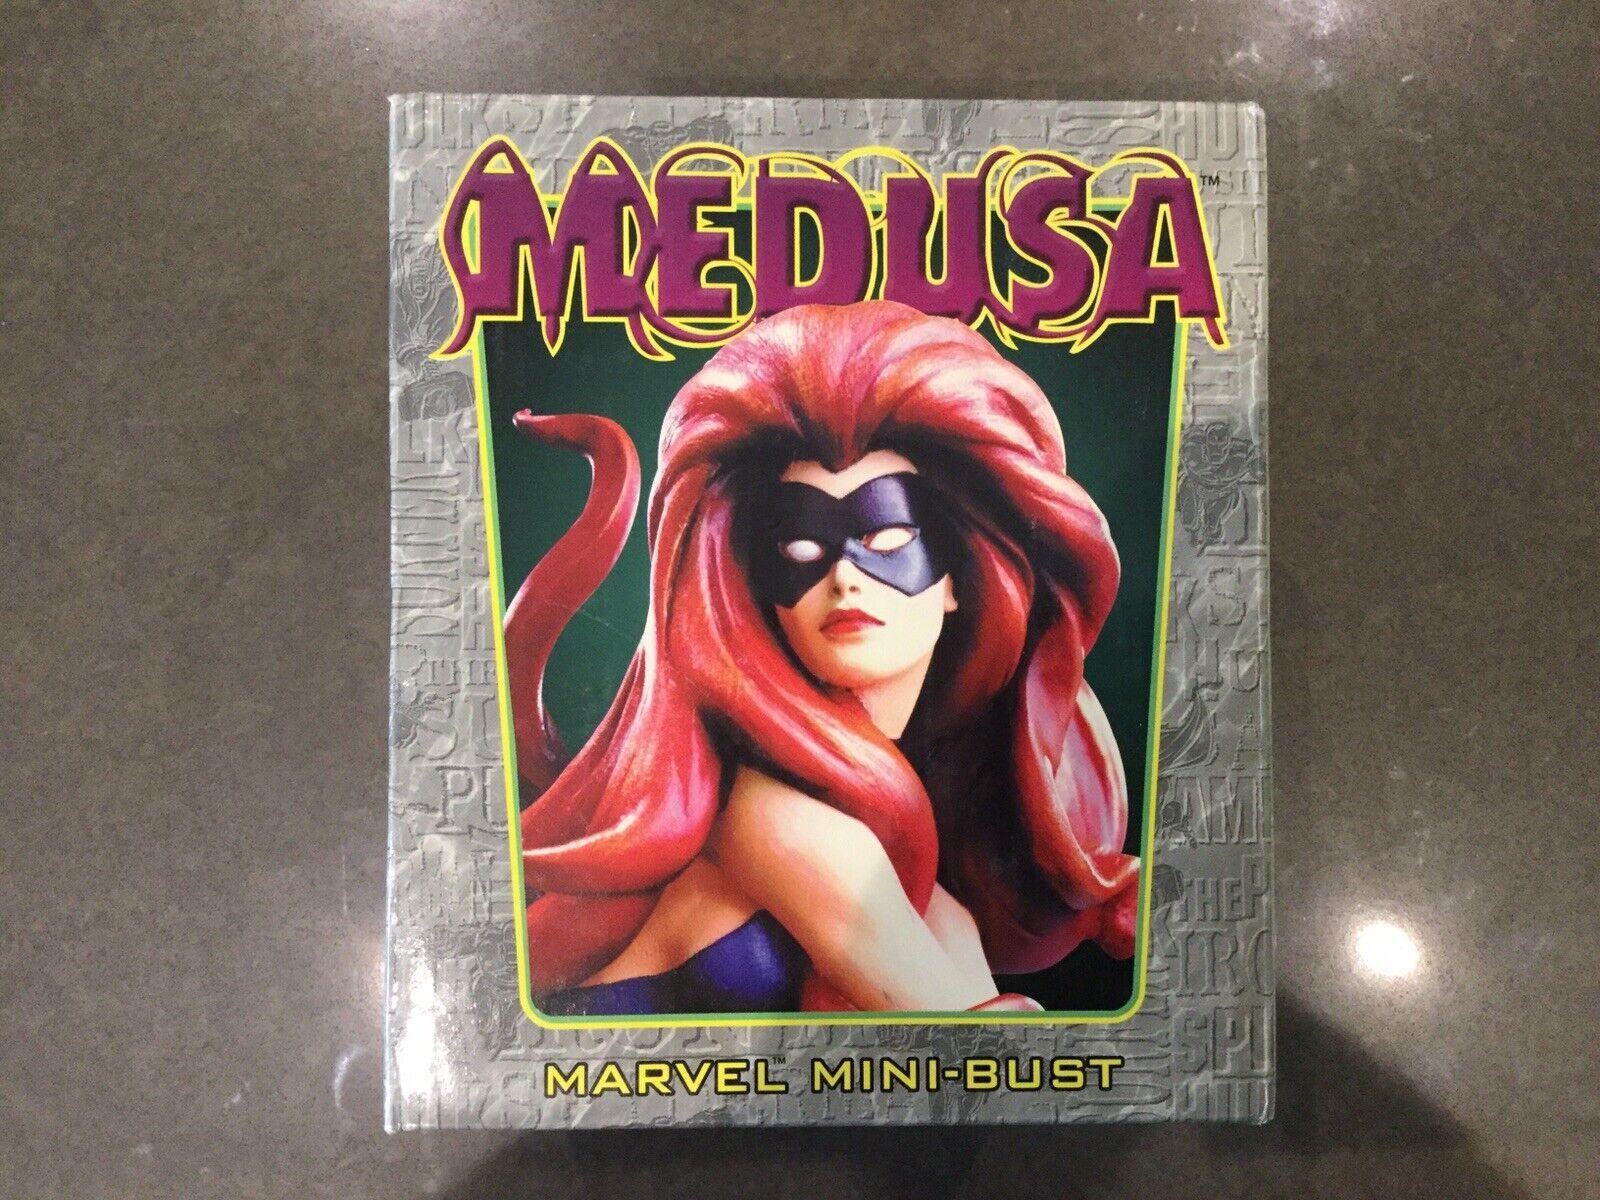 2003 MARVEL Randy Bowen MEDUSA Mini-Busto 1991 5000 inumani RARO